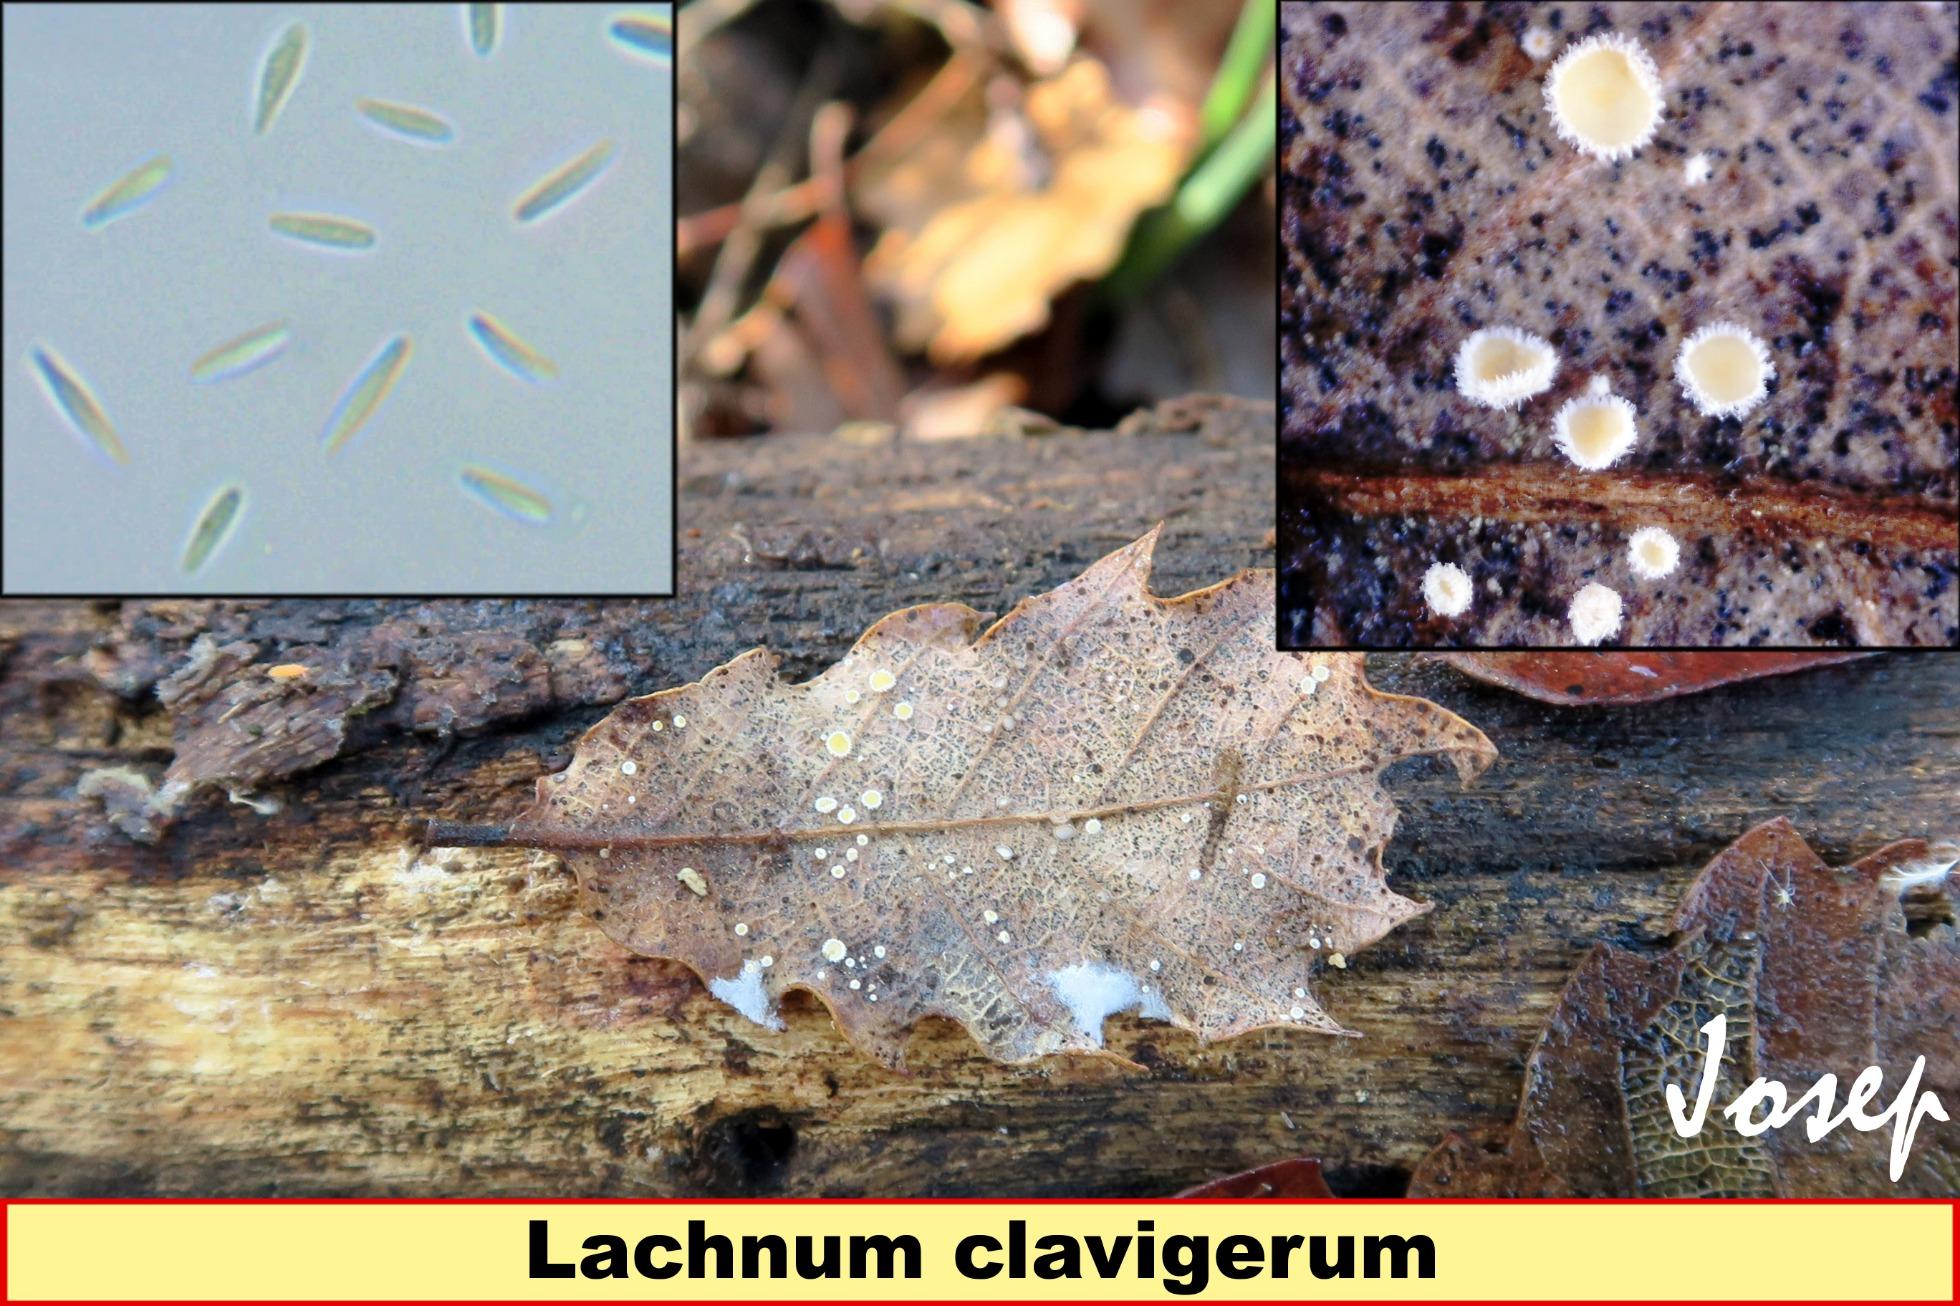 Lachnumclavigerum.jpg